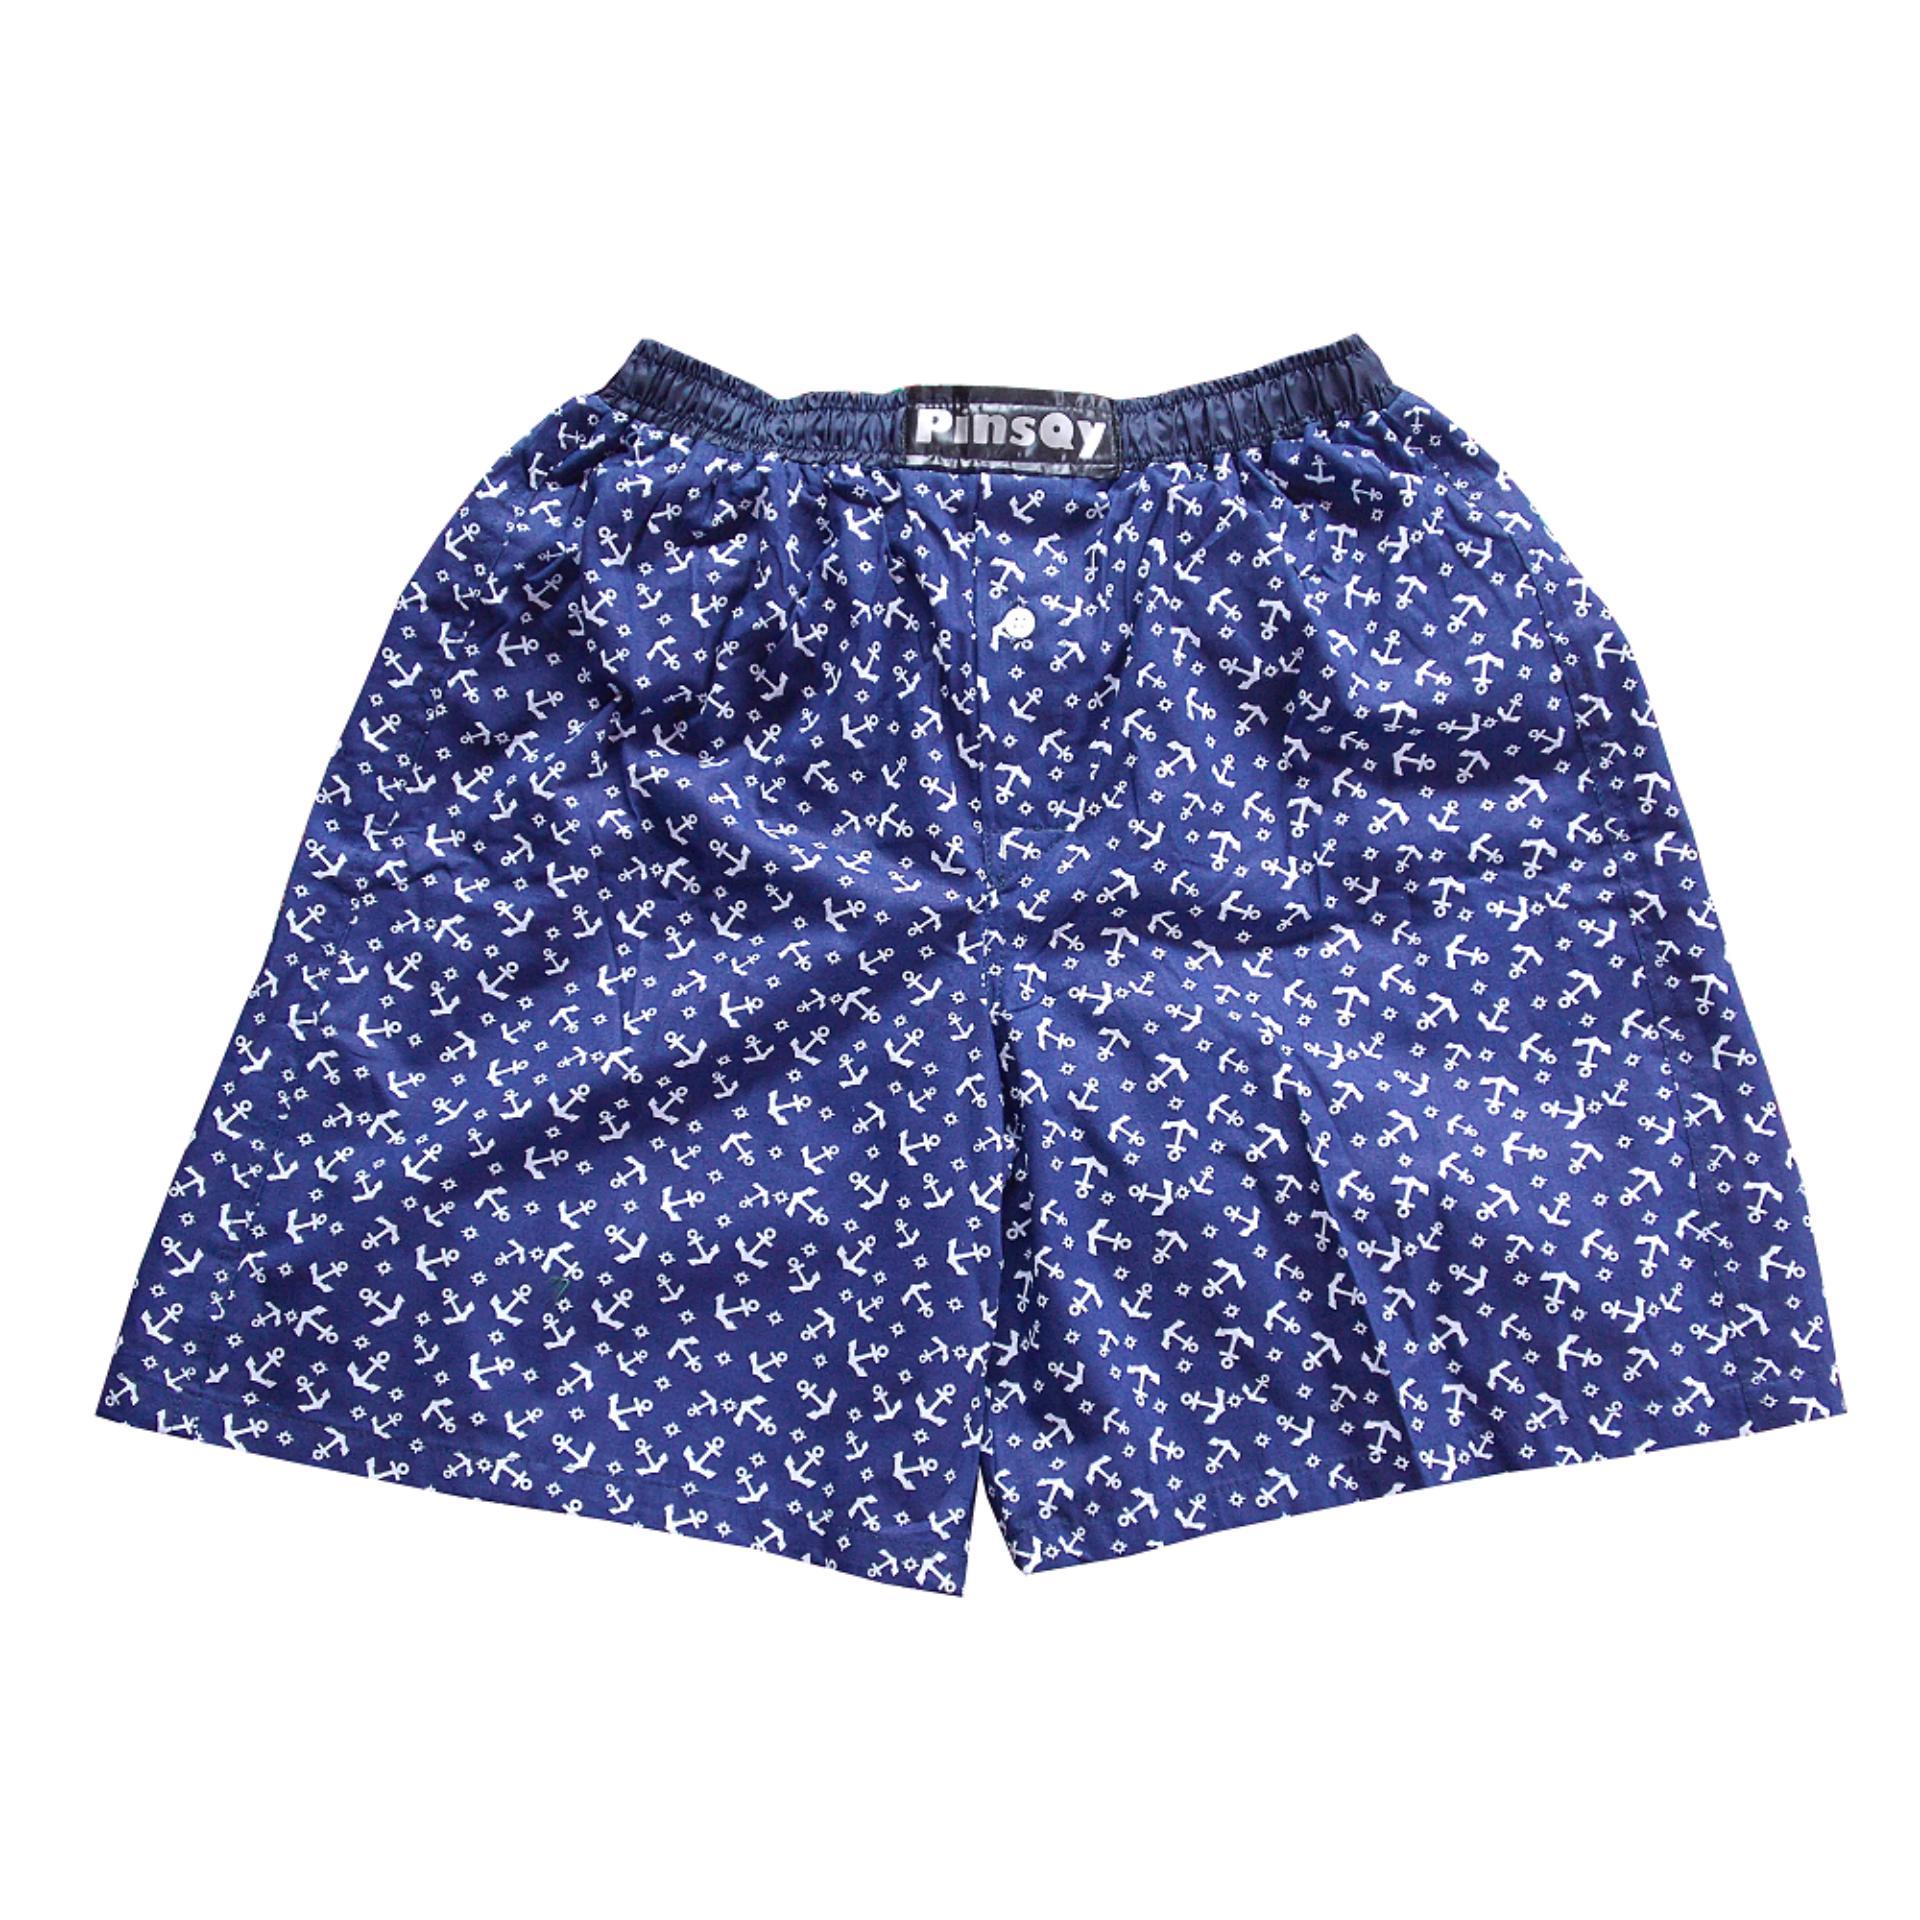 Harga Penawaran Pinsqy Boxer Pria Wanita Celana Pendek Material P 1 Dalam Seamless Trunks 01 2 Pcs Katun Korea